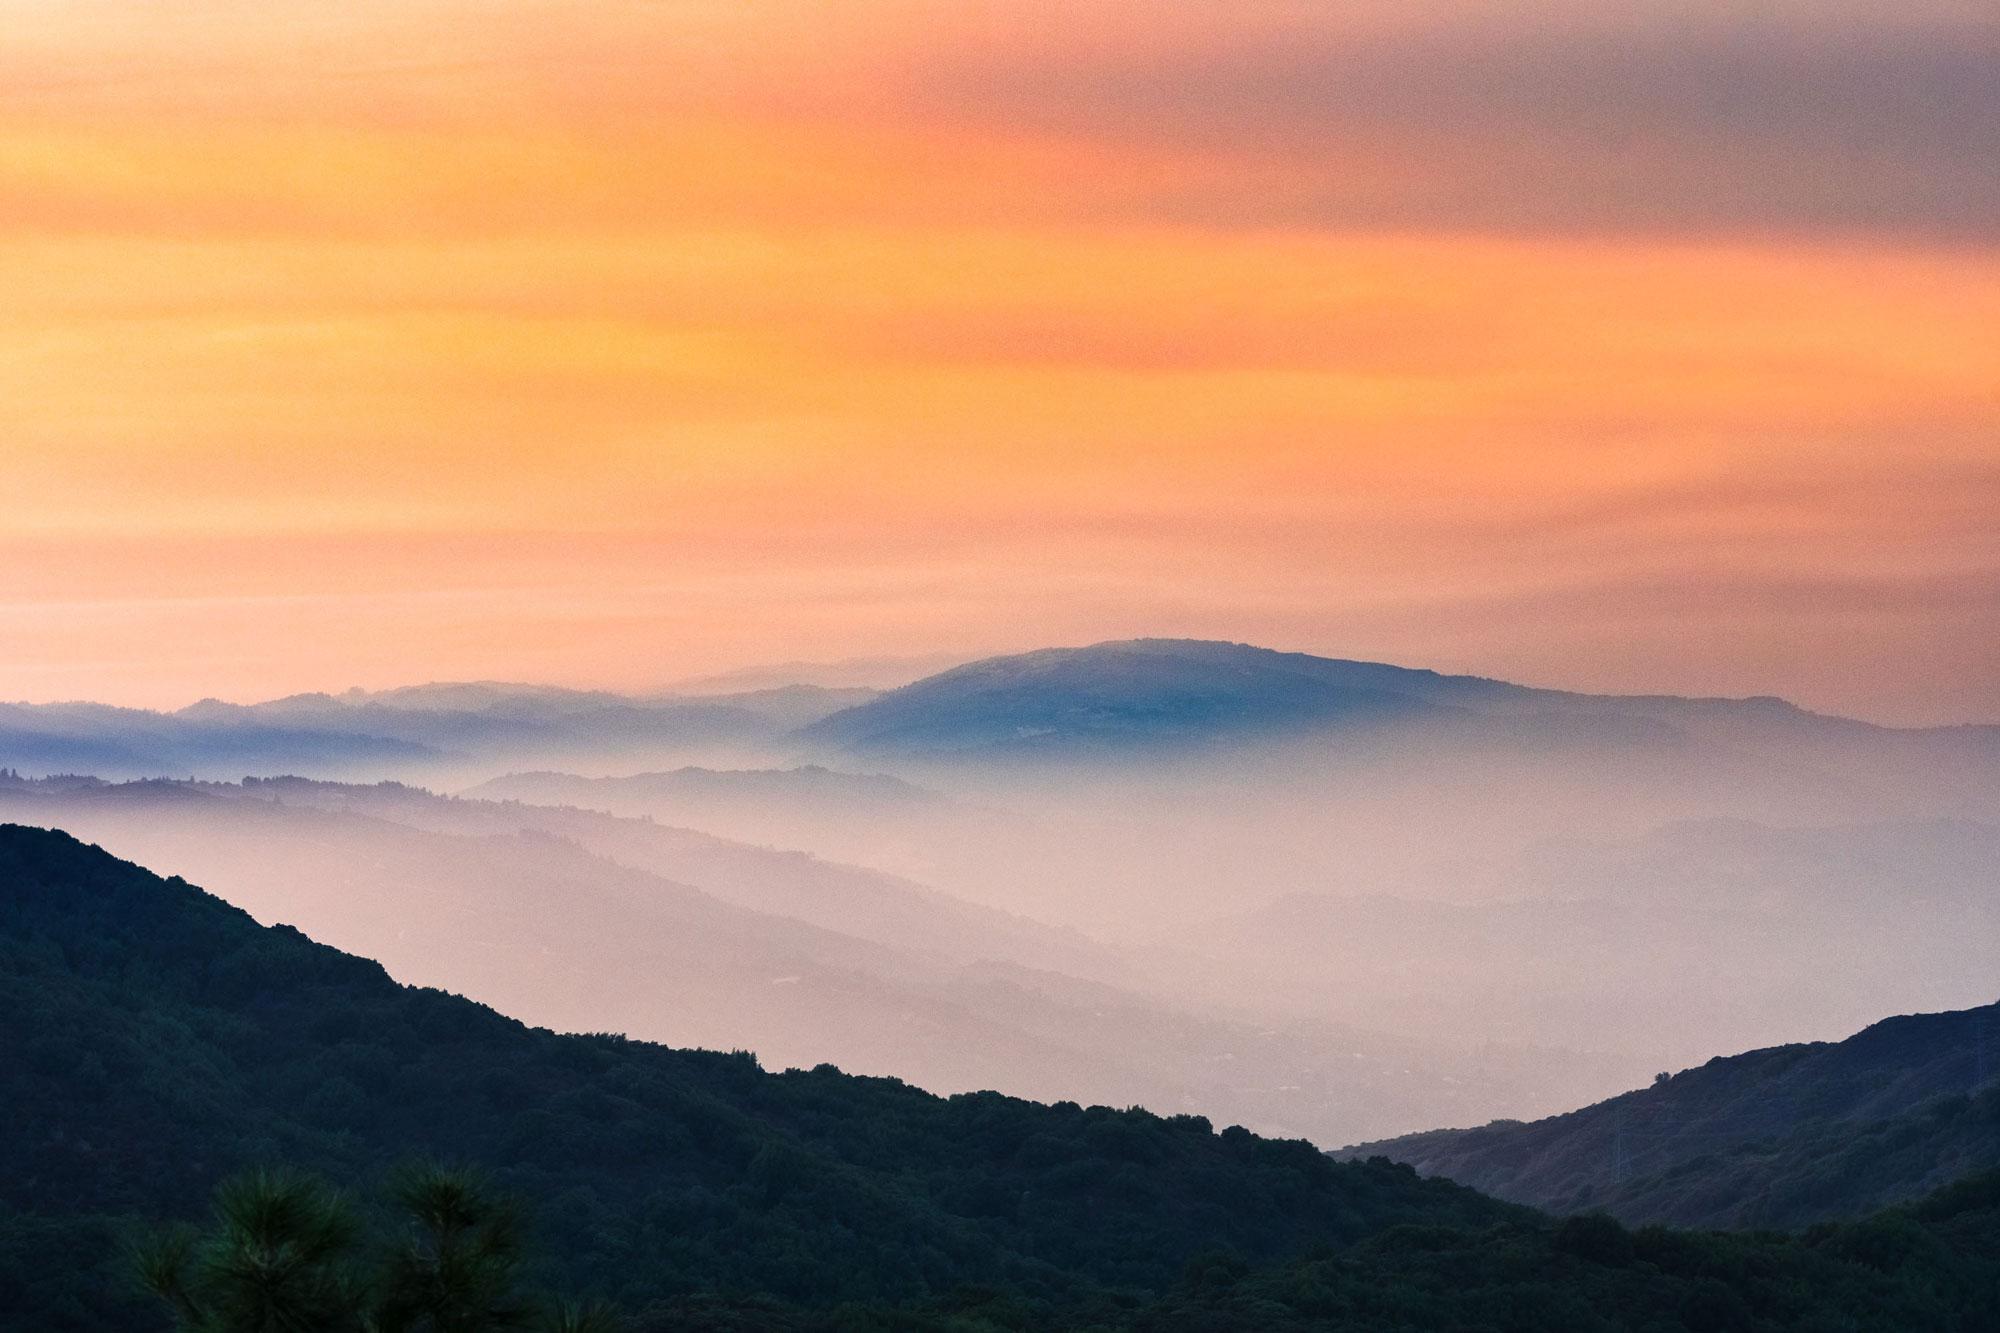 photo - Sunset Views in Santa Cruz Mountains, California